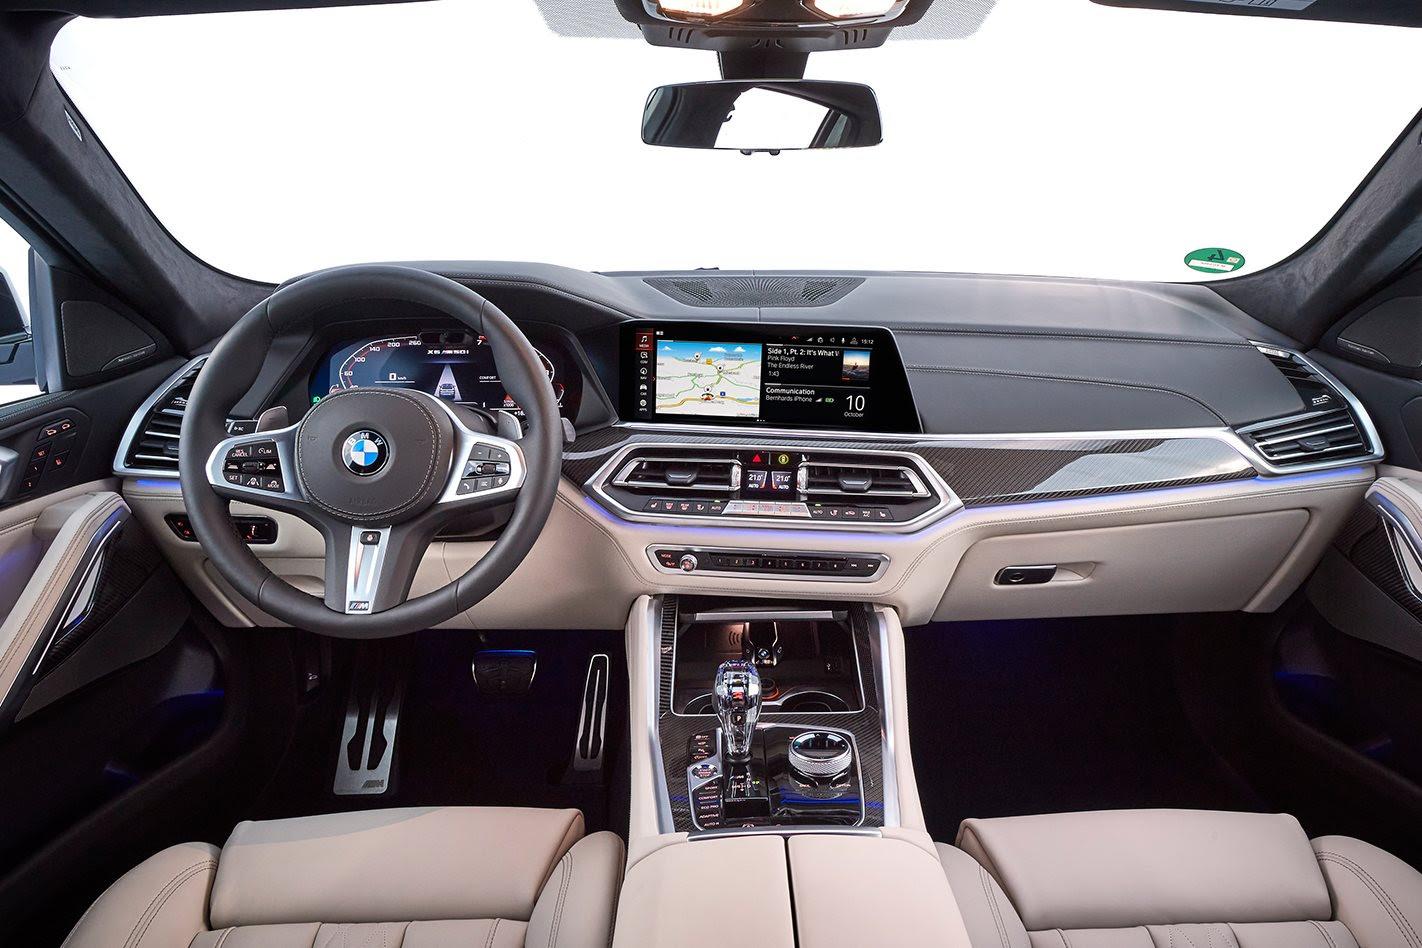 BMW X6 M50i cabin